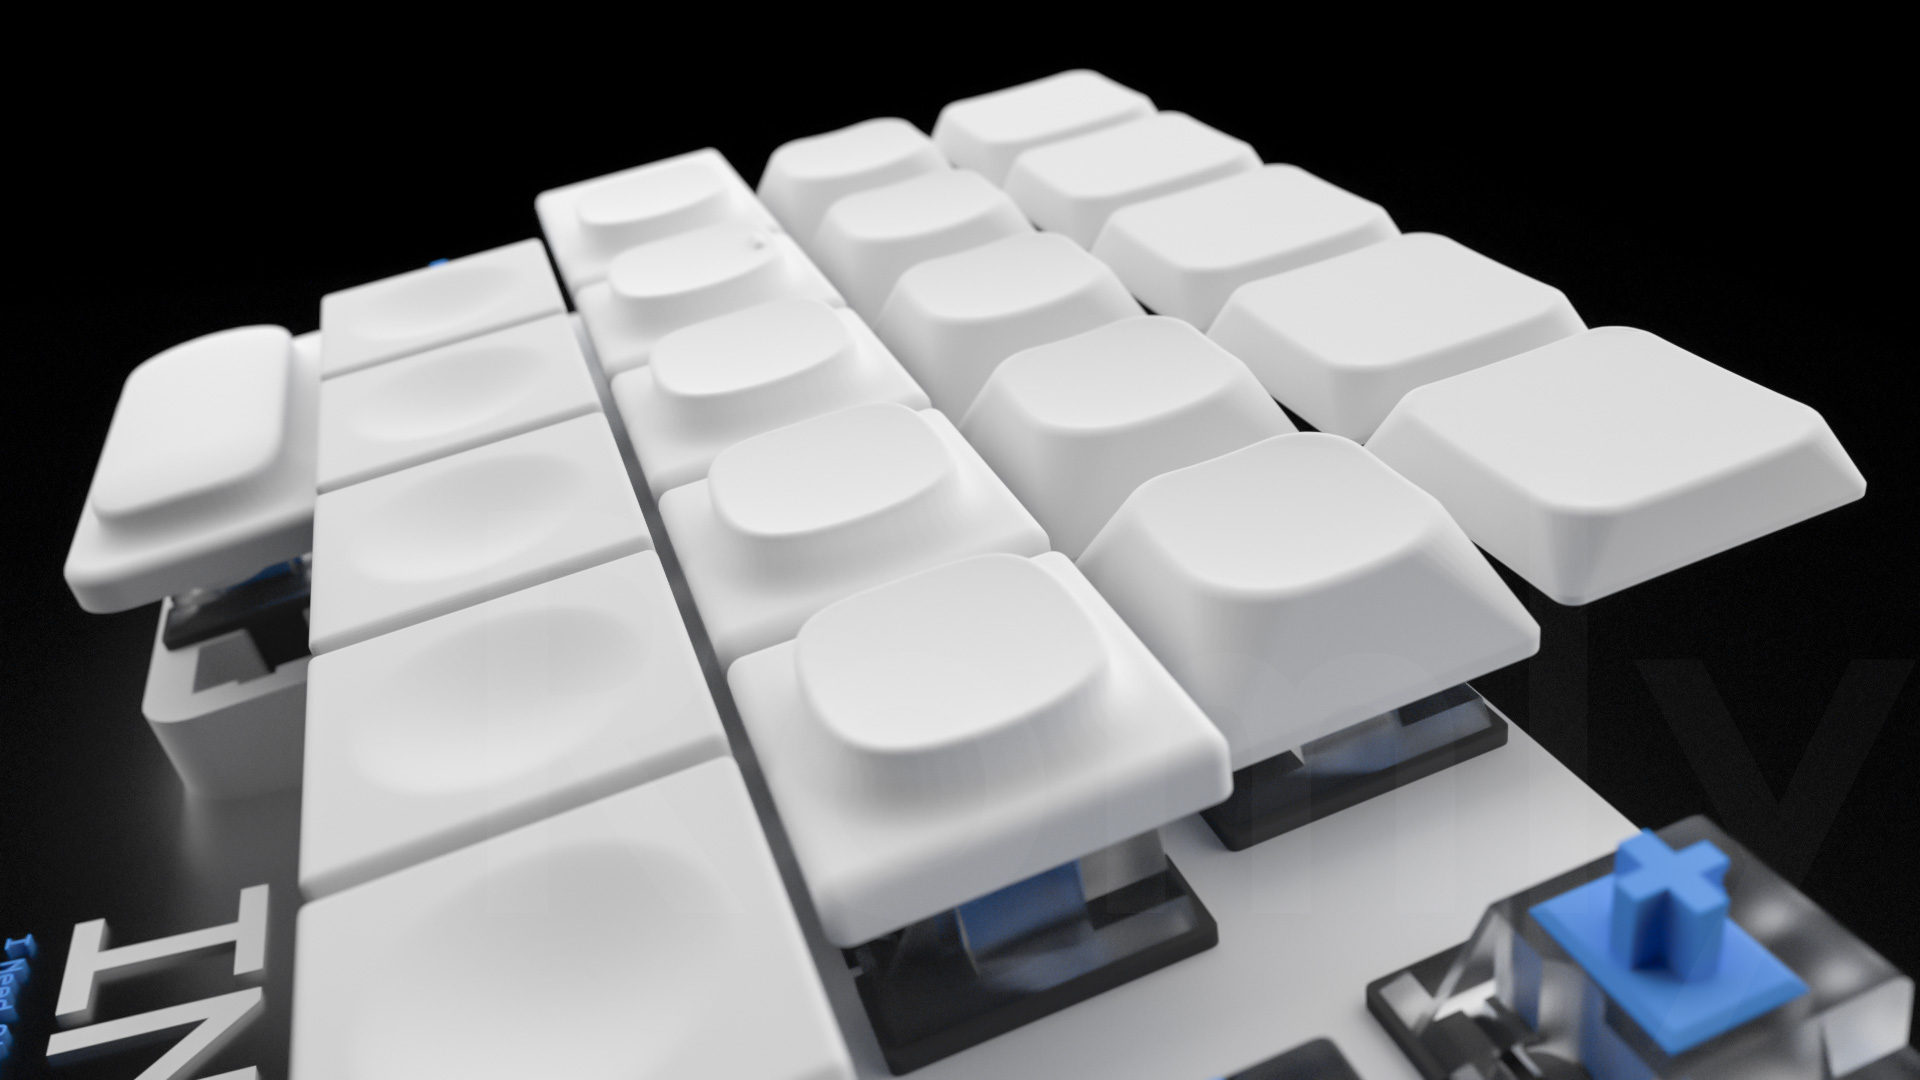 INSS40 keycaps